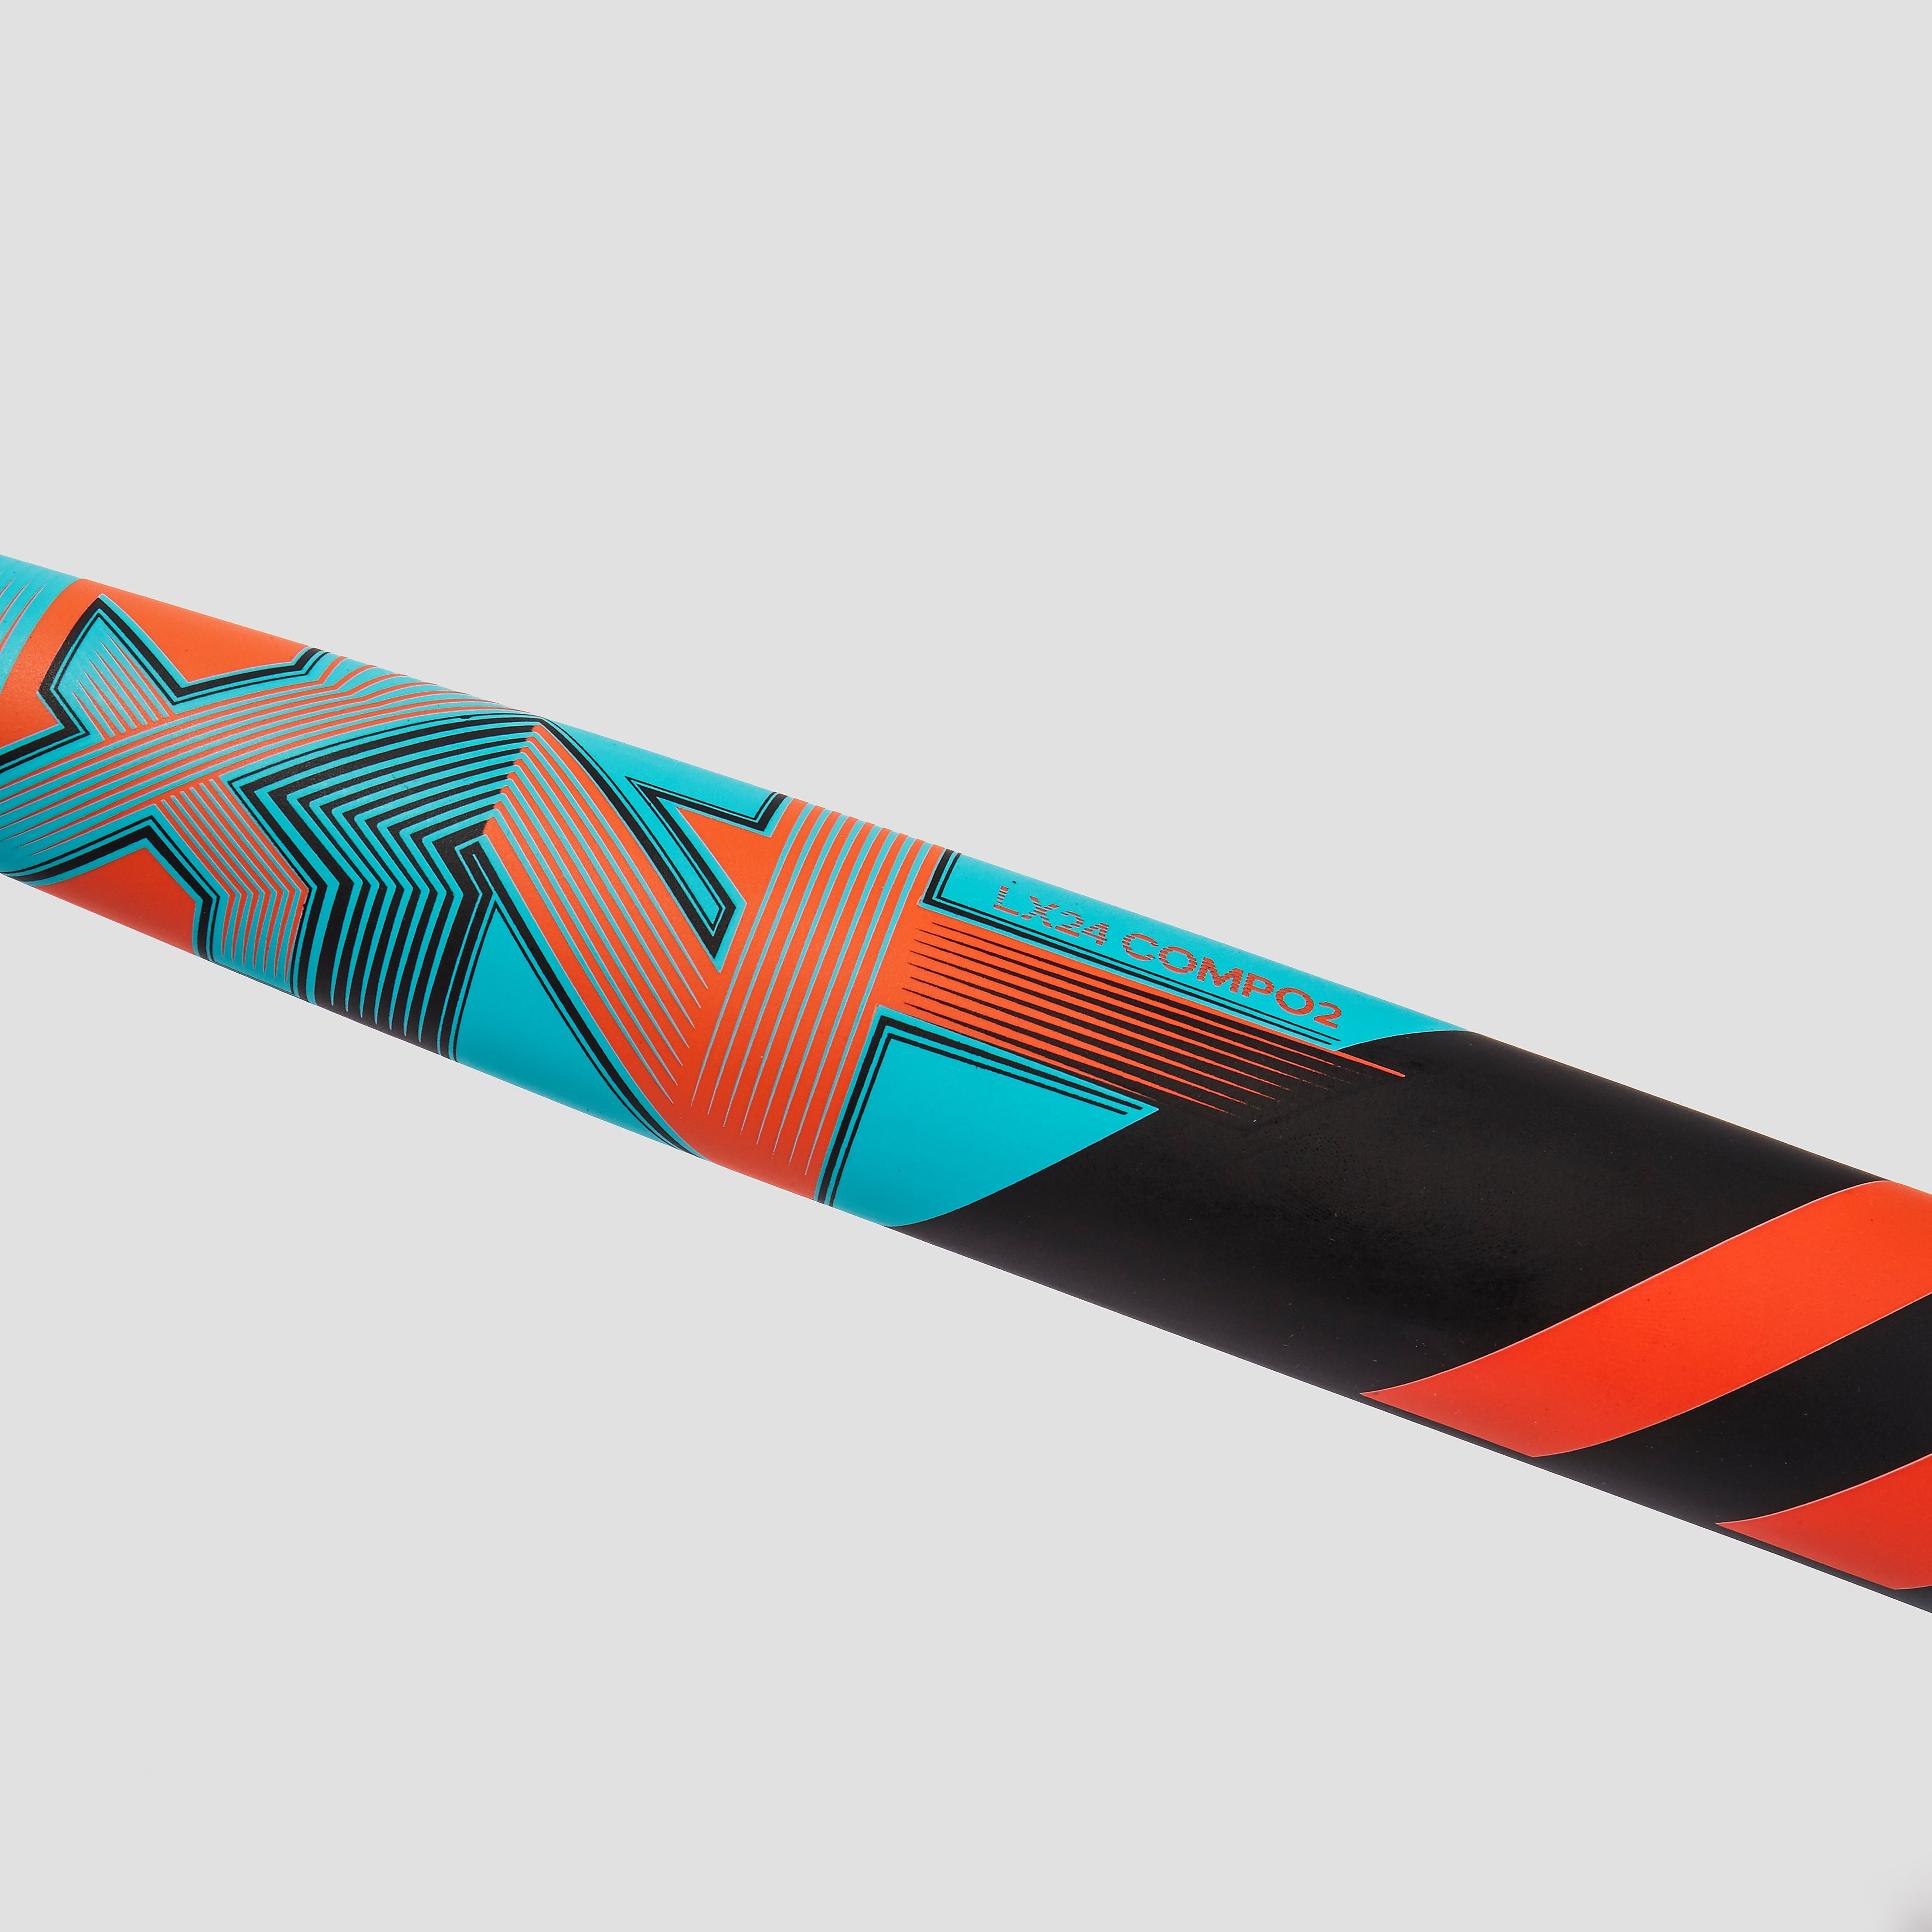 adidas LX24 Compo 2 hockey stick